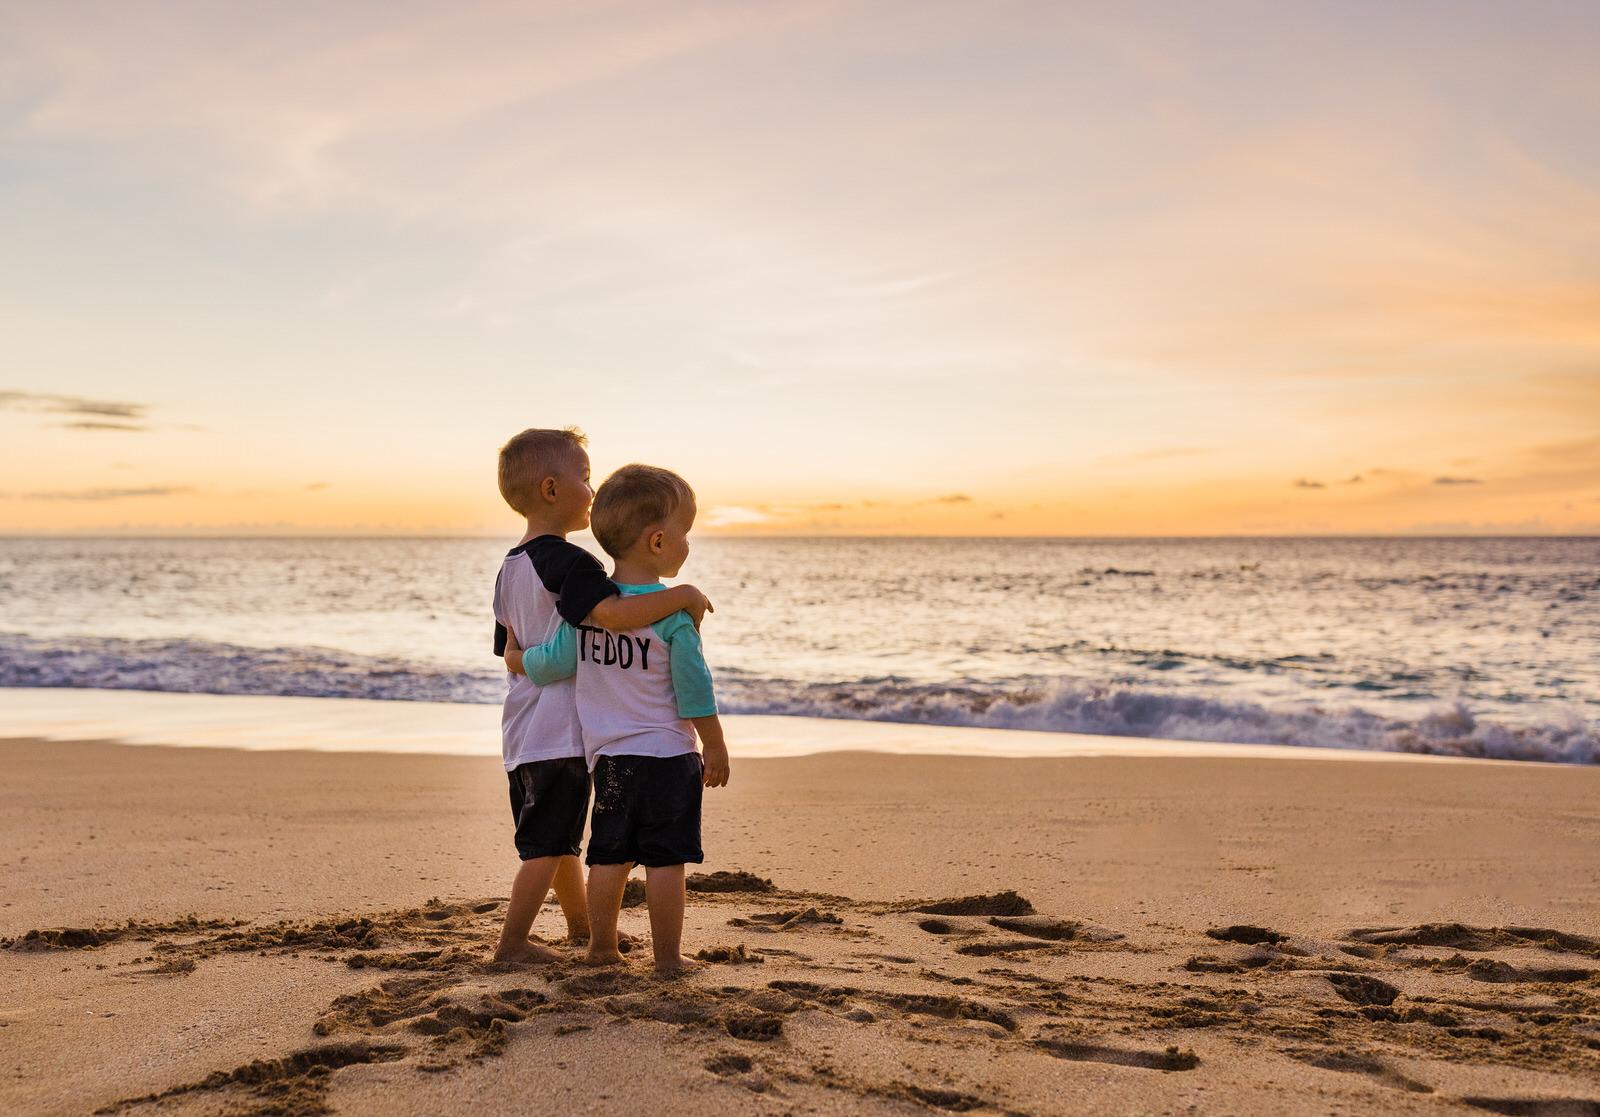 extended-family-big-island-vacation-cousins-grandparents-beach-waikoloa-sunset-hawaii-7376-1.jpg